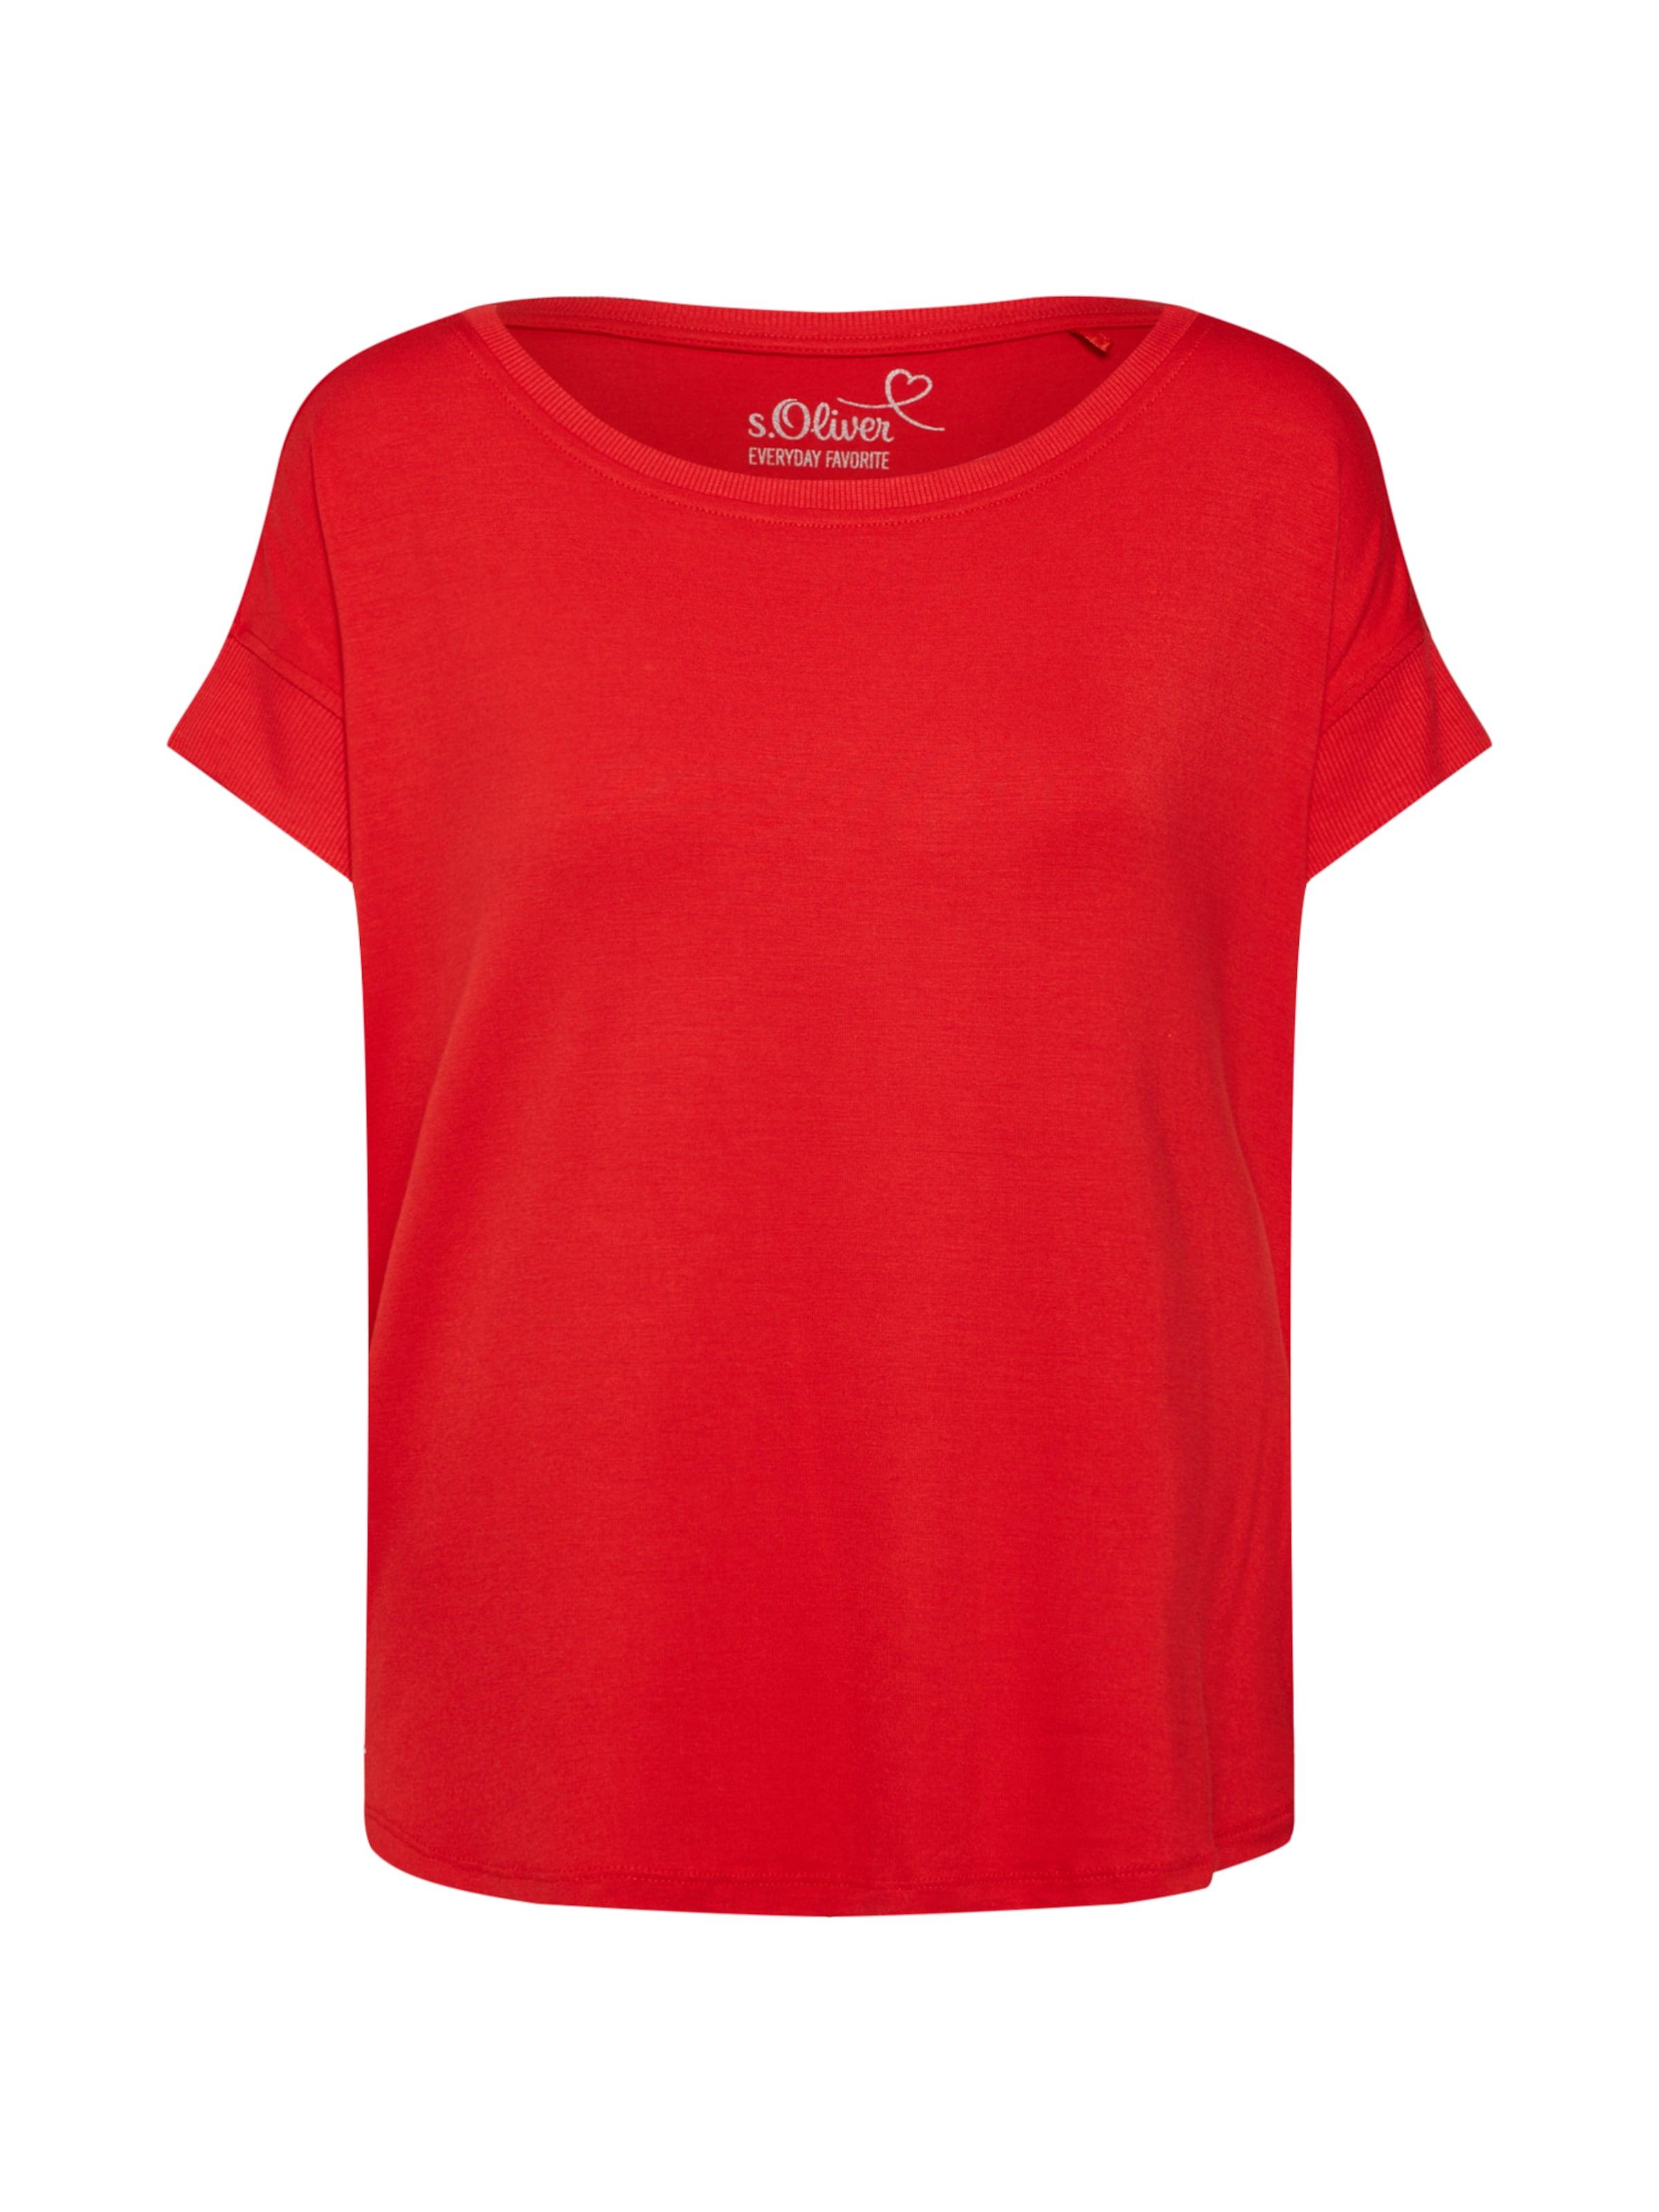 shirt Red Label En Rose Ancienne S oliver T IEYWHe2D9